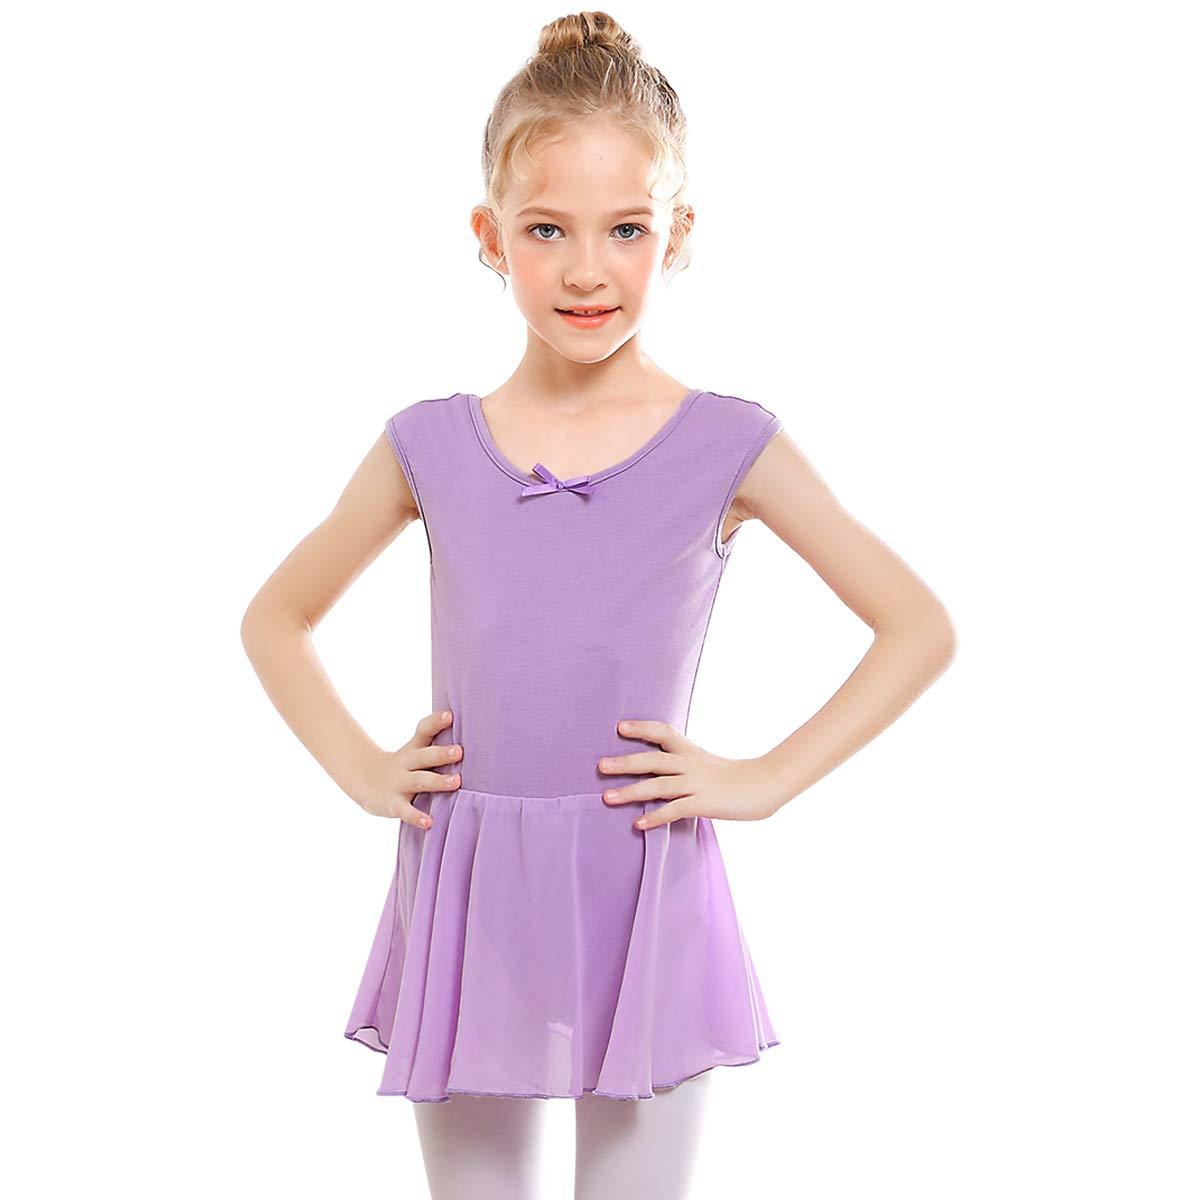 87b5c917ba3d STELLE Girl s Short Sleeve Tutu Dress Tank Top Leotard for Dance ...